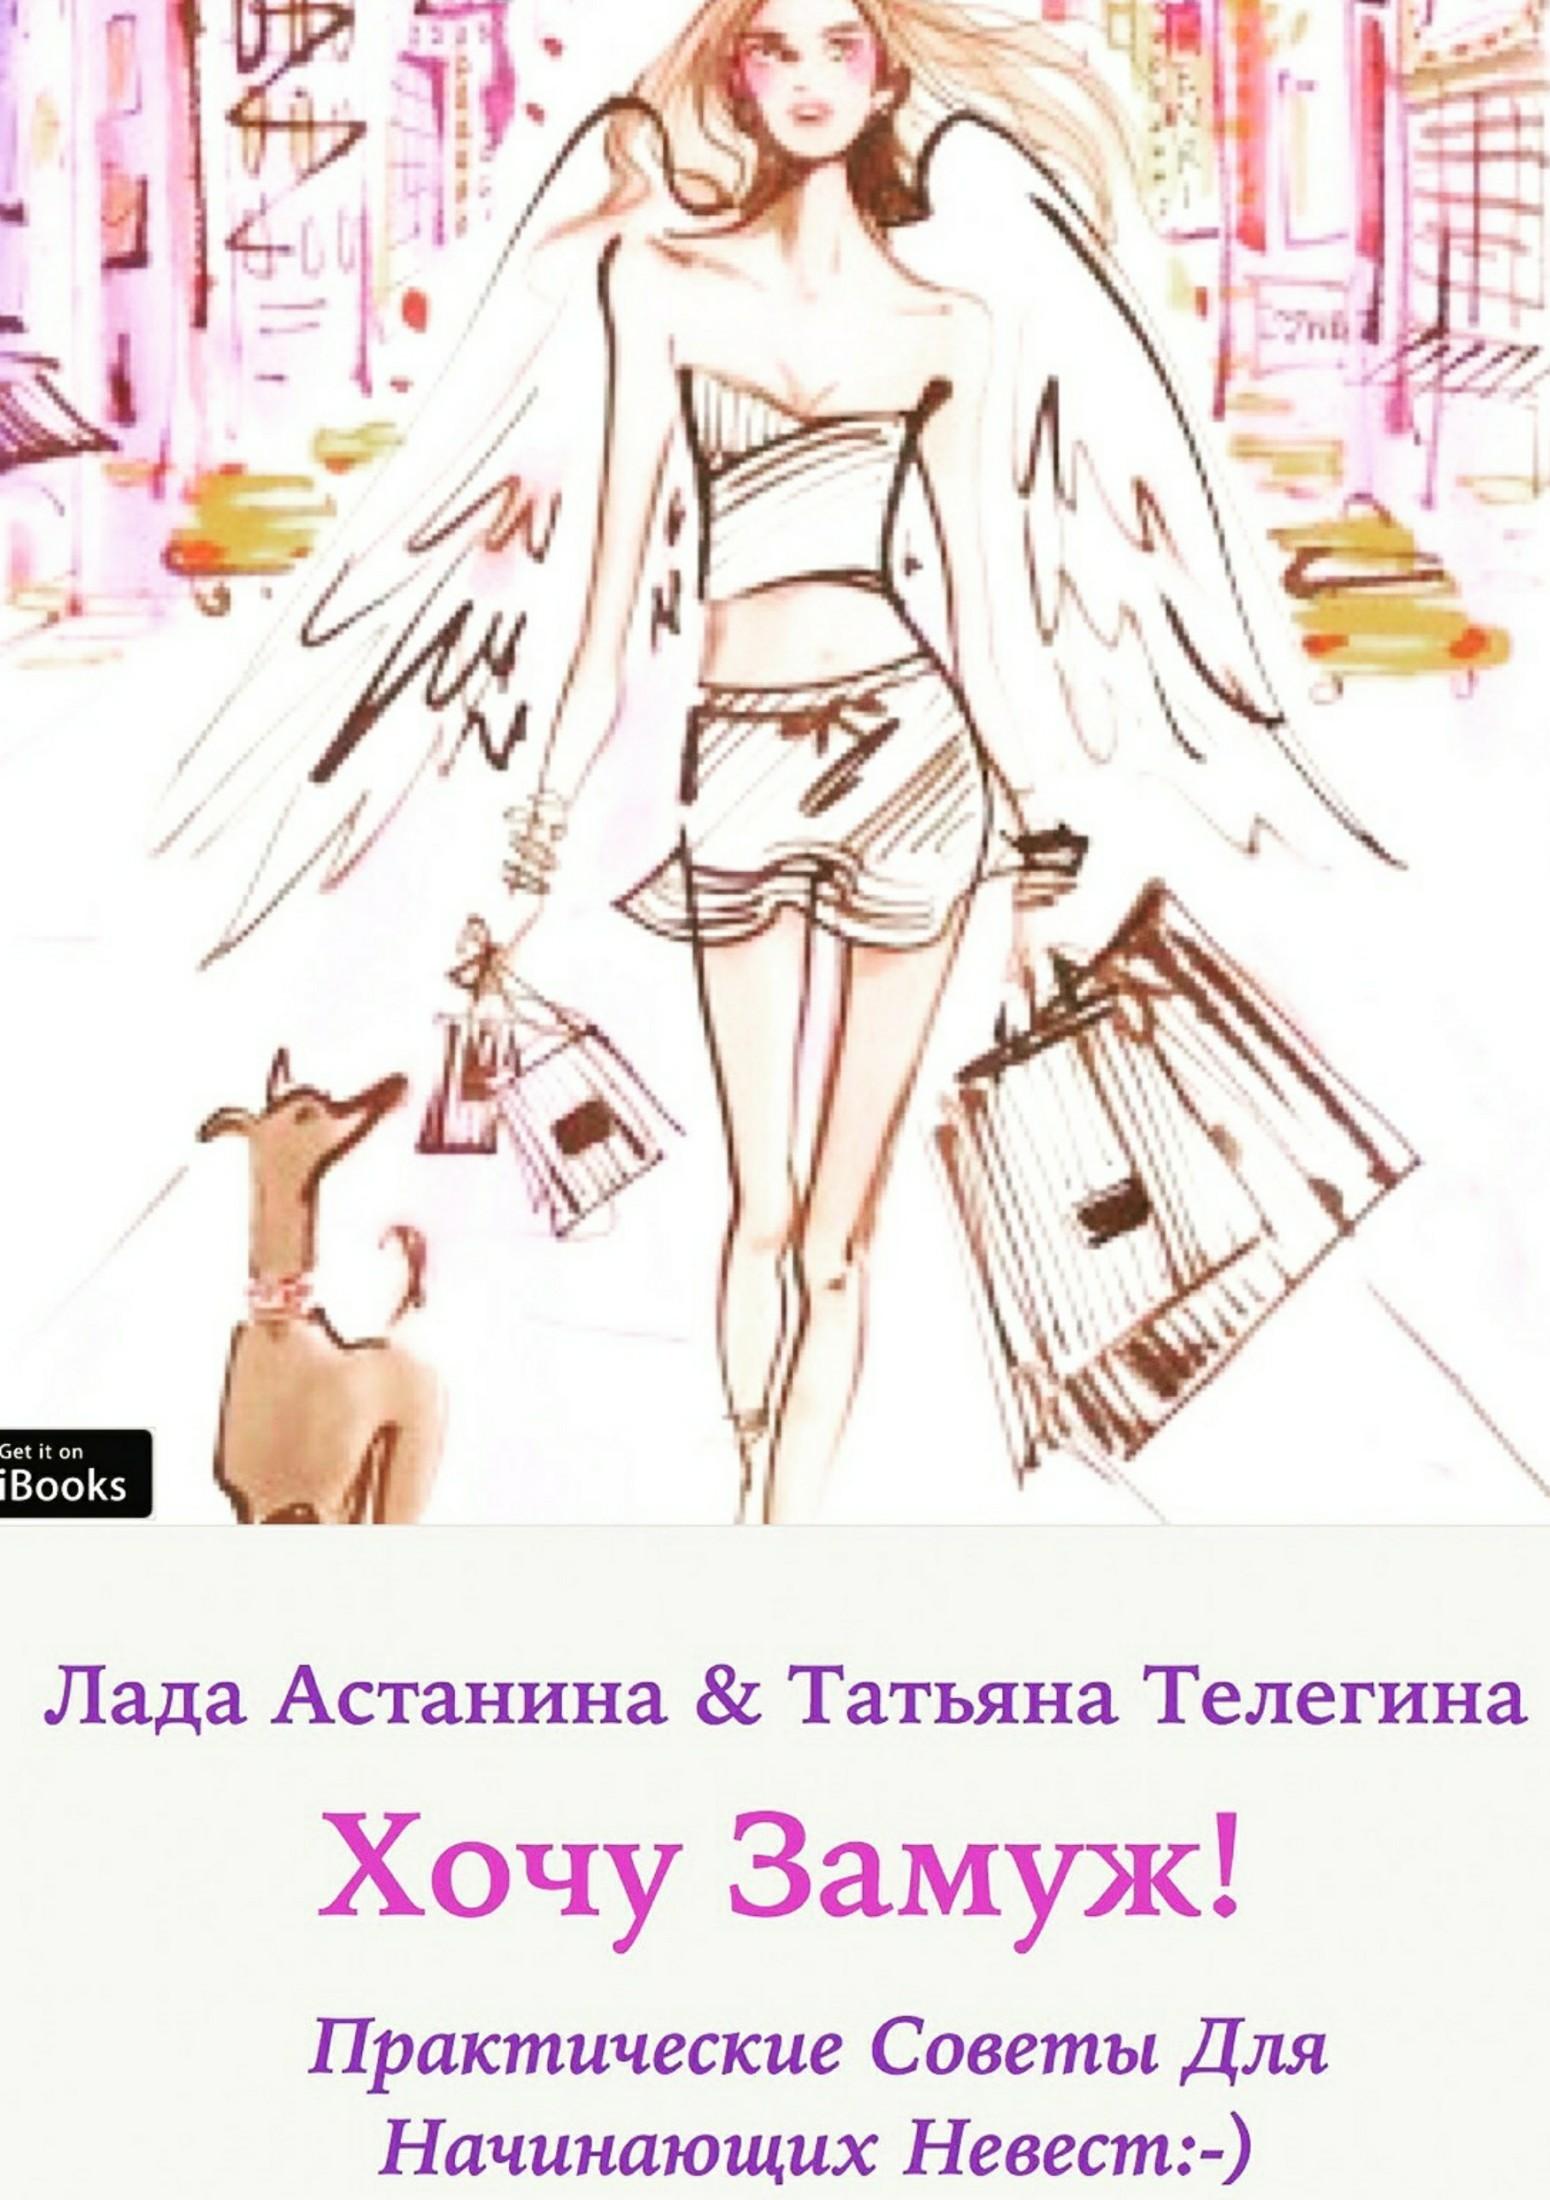 Татьяна Телегина. Хочу замуж!